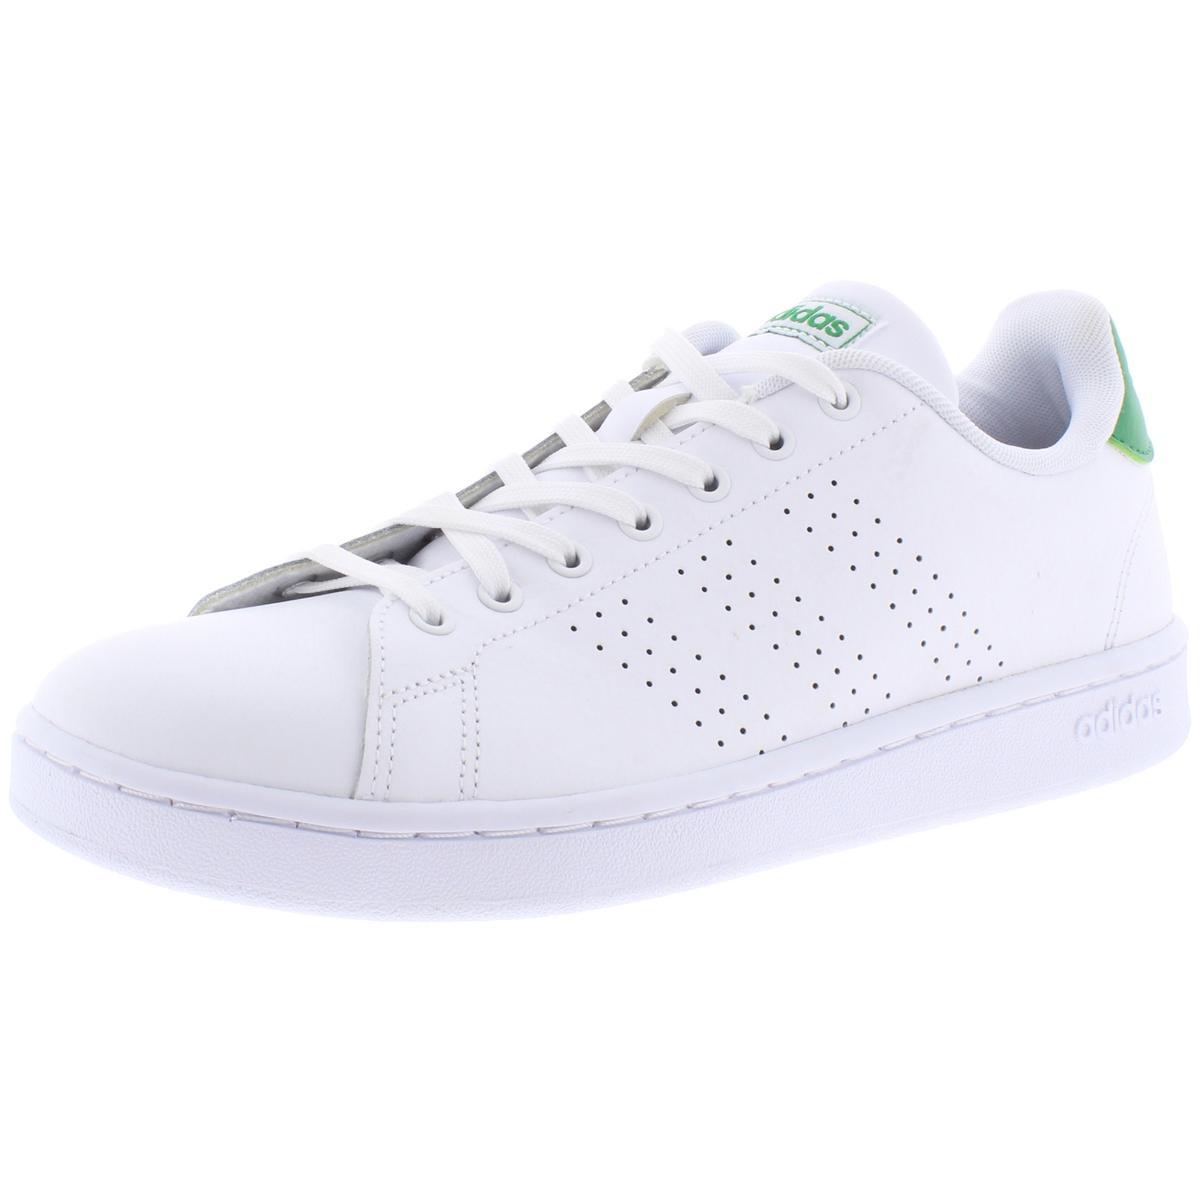 Adidas Mens Advantage White Tennis Shoes Sneakers 10.5 Mediu